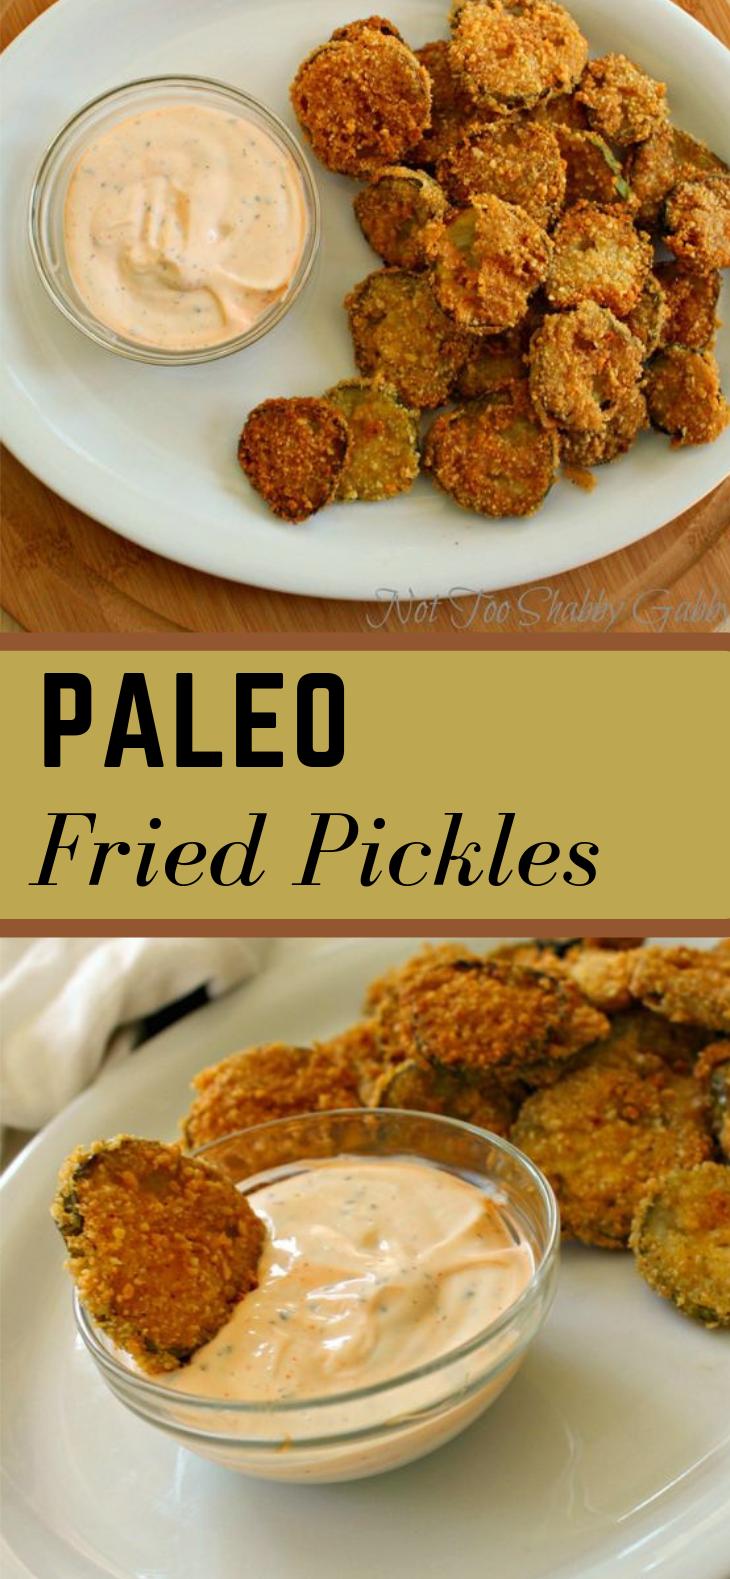 PALEO FRIED PICKLES #paleo #healthydiet